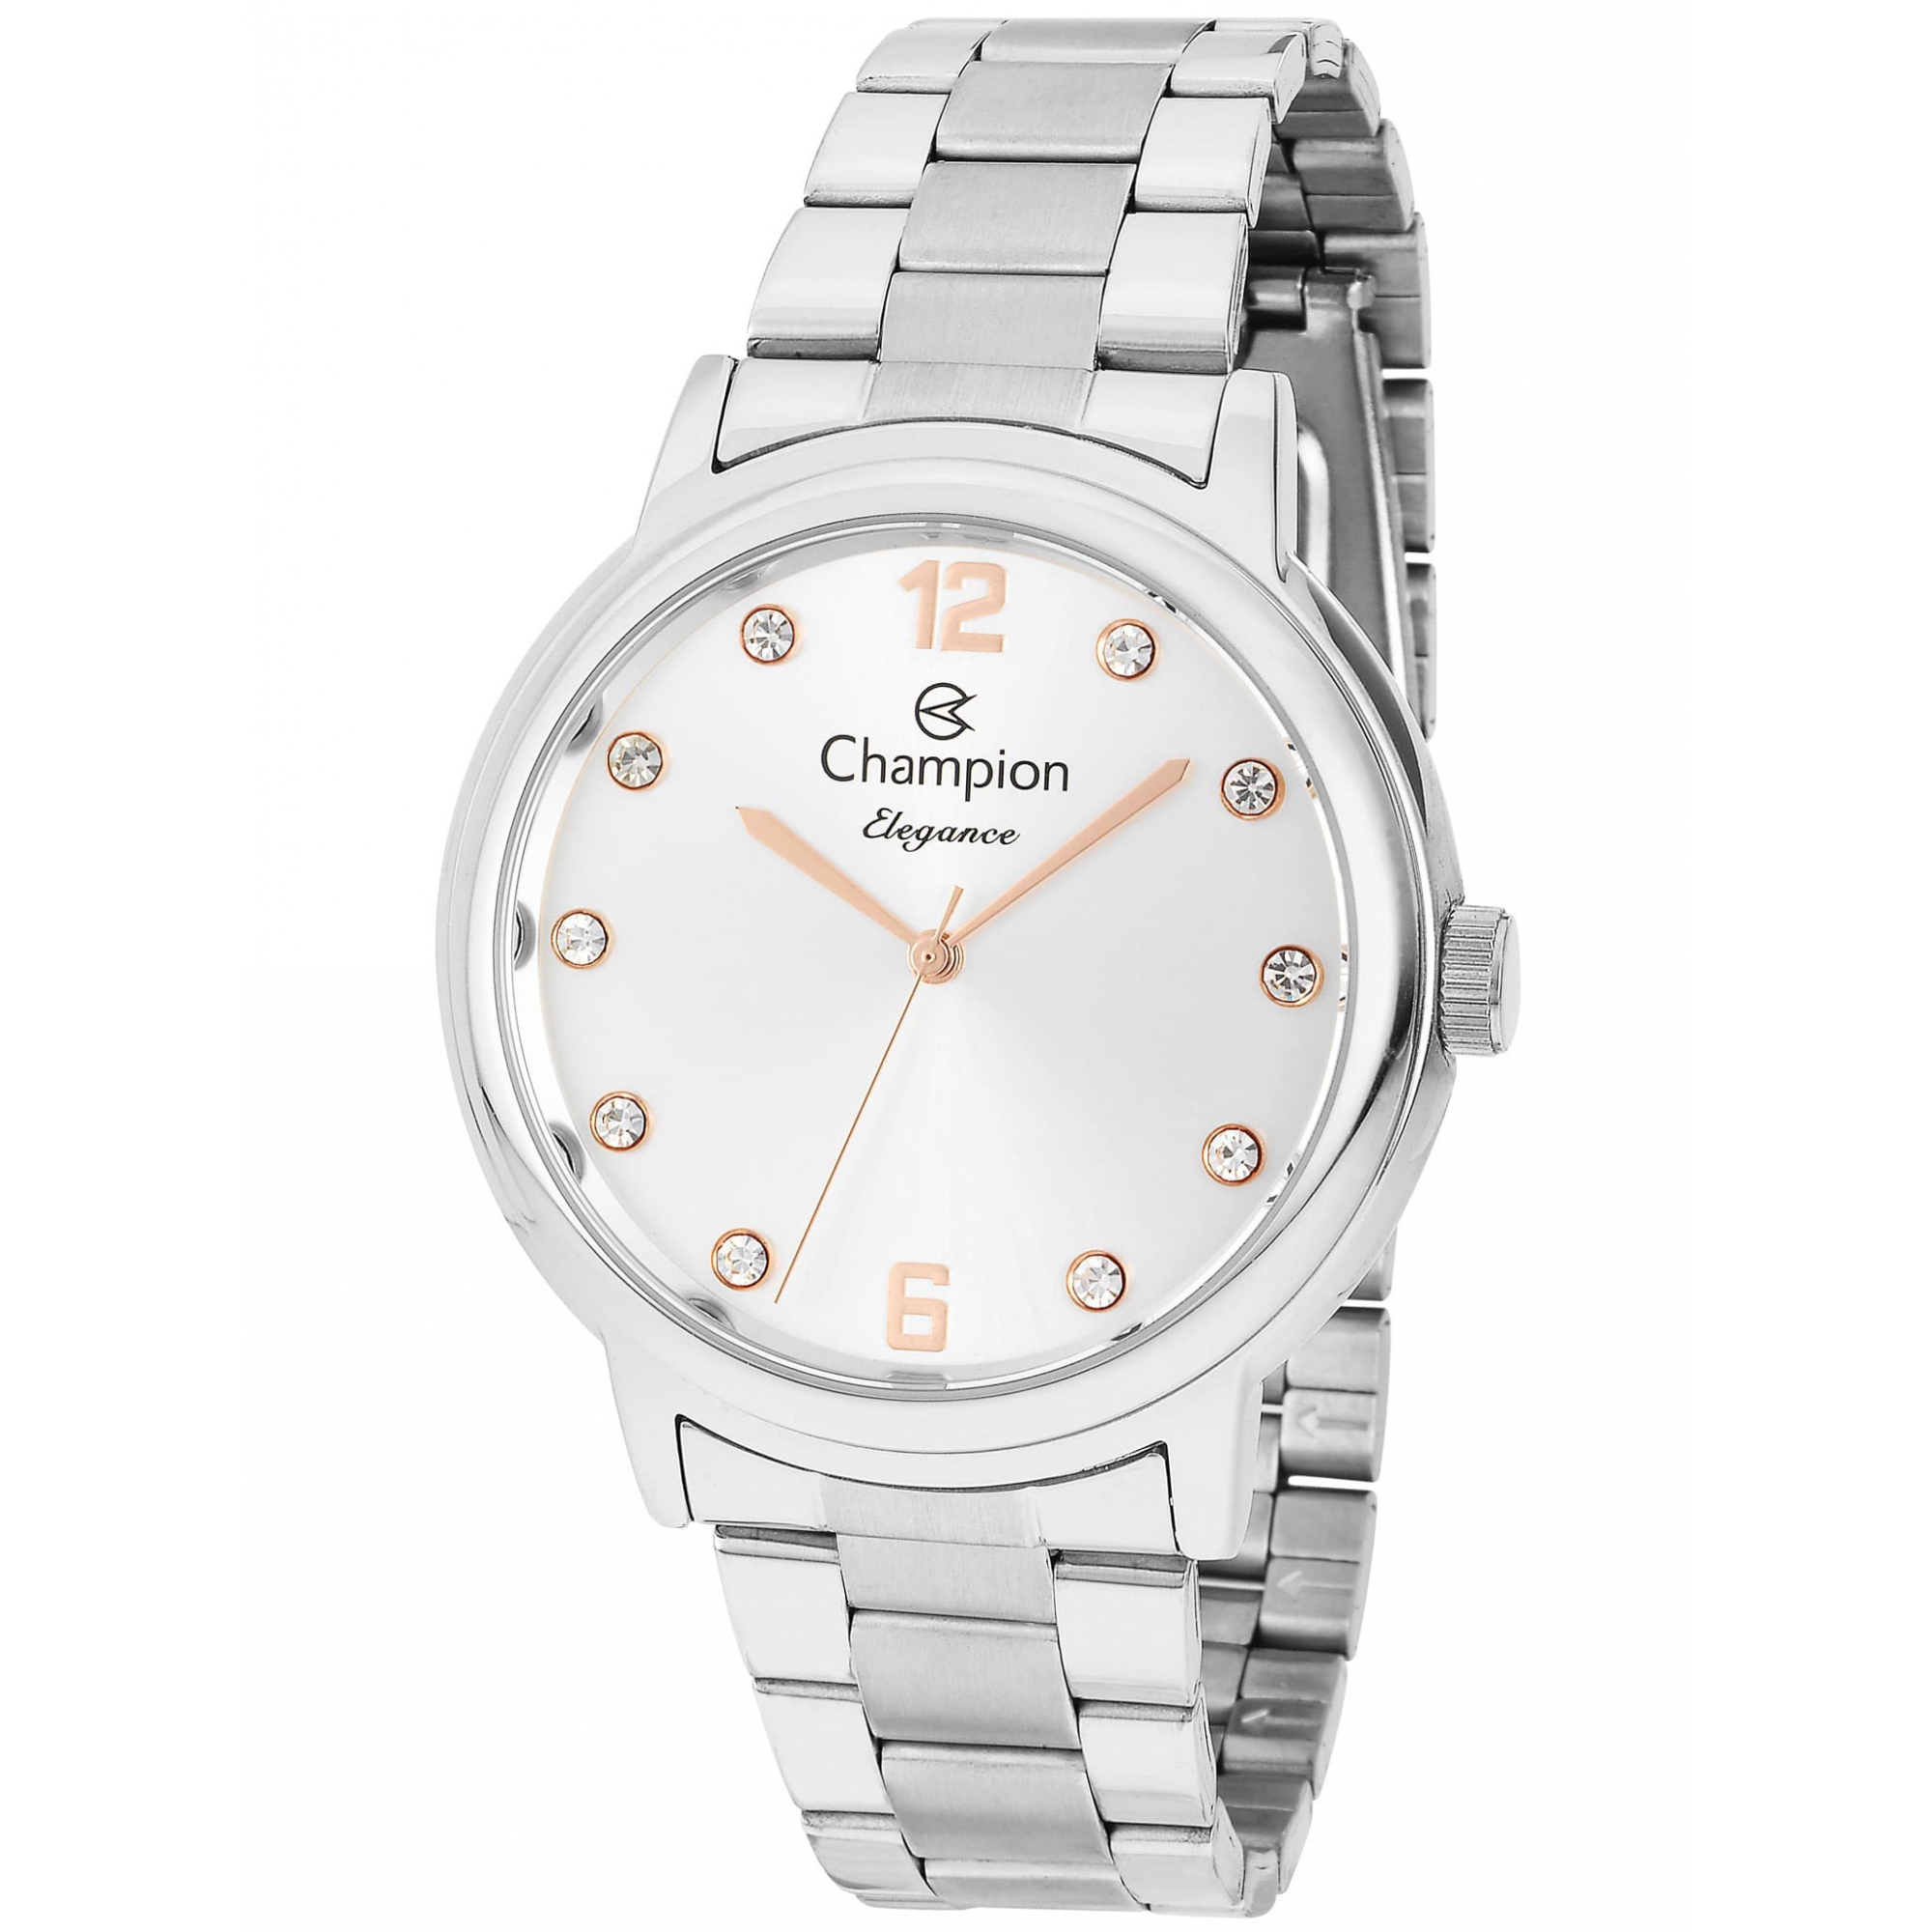 Relógio Champion Feminino Prateado - Elegance - CN28437Q